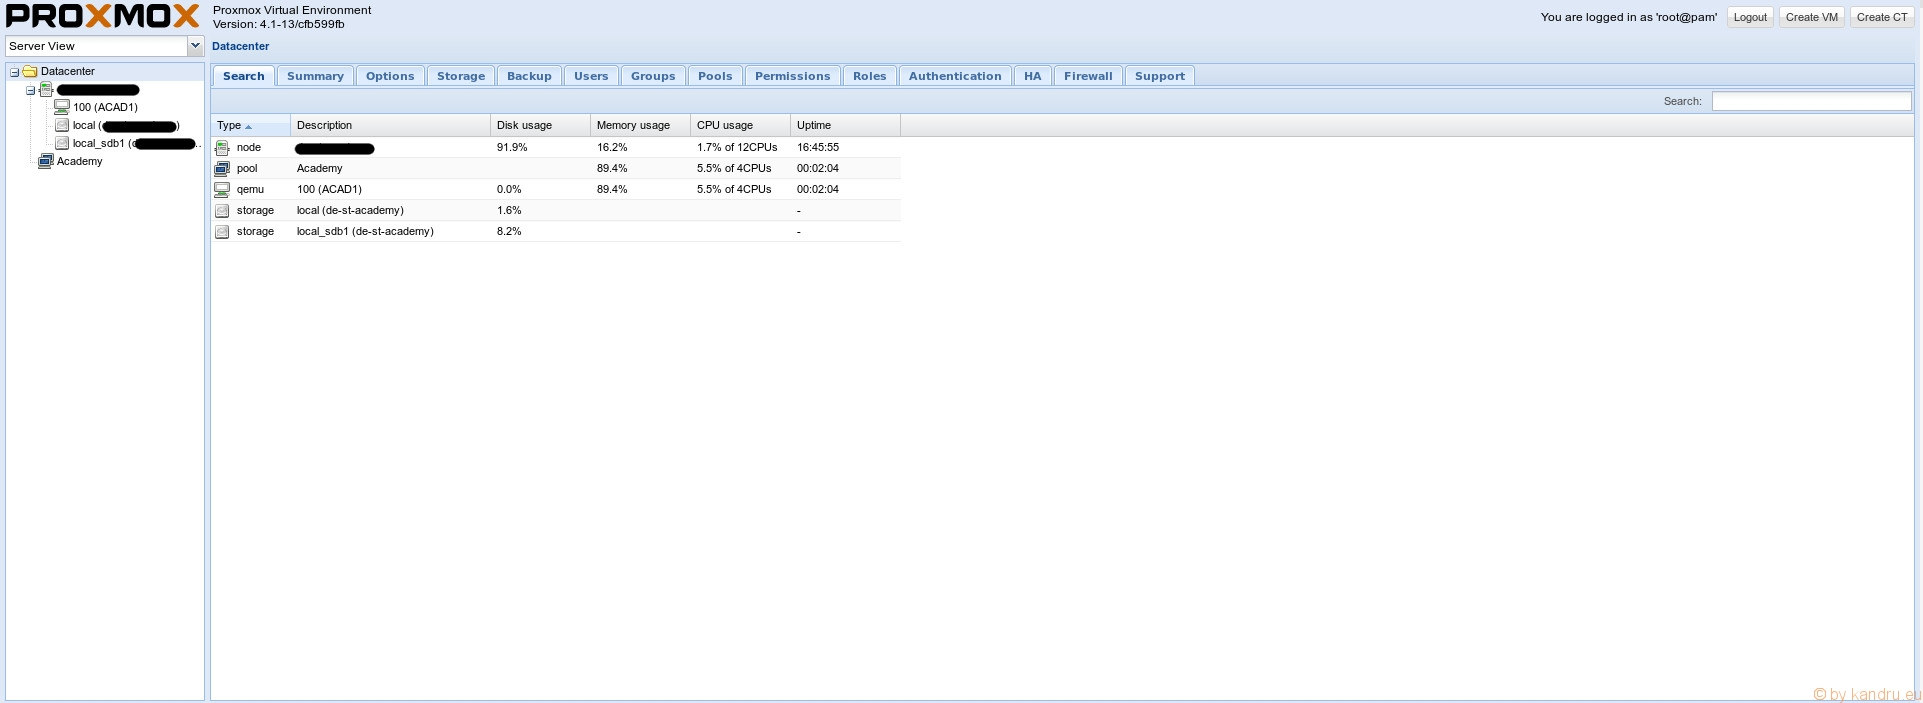 Hyper-V 2012 R2 (Generation 2) zu Proxmox 4.1 migrieren